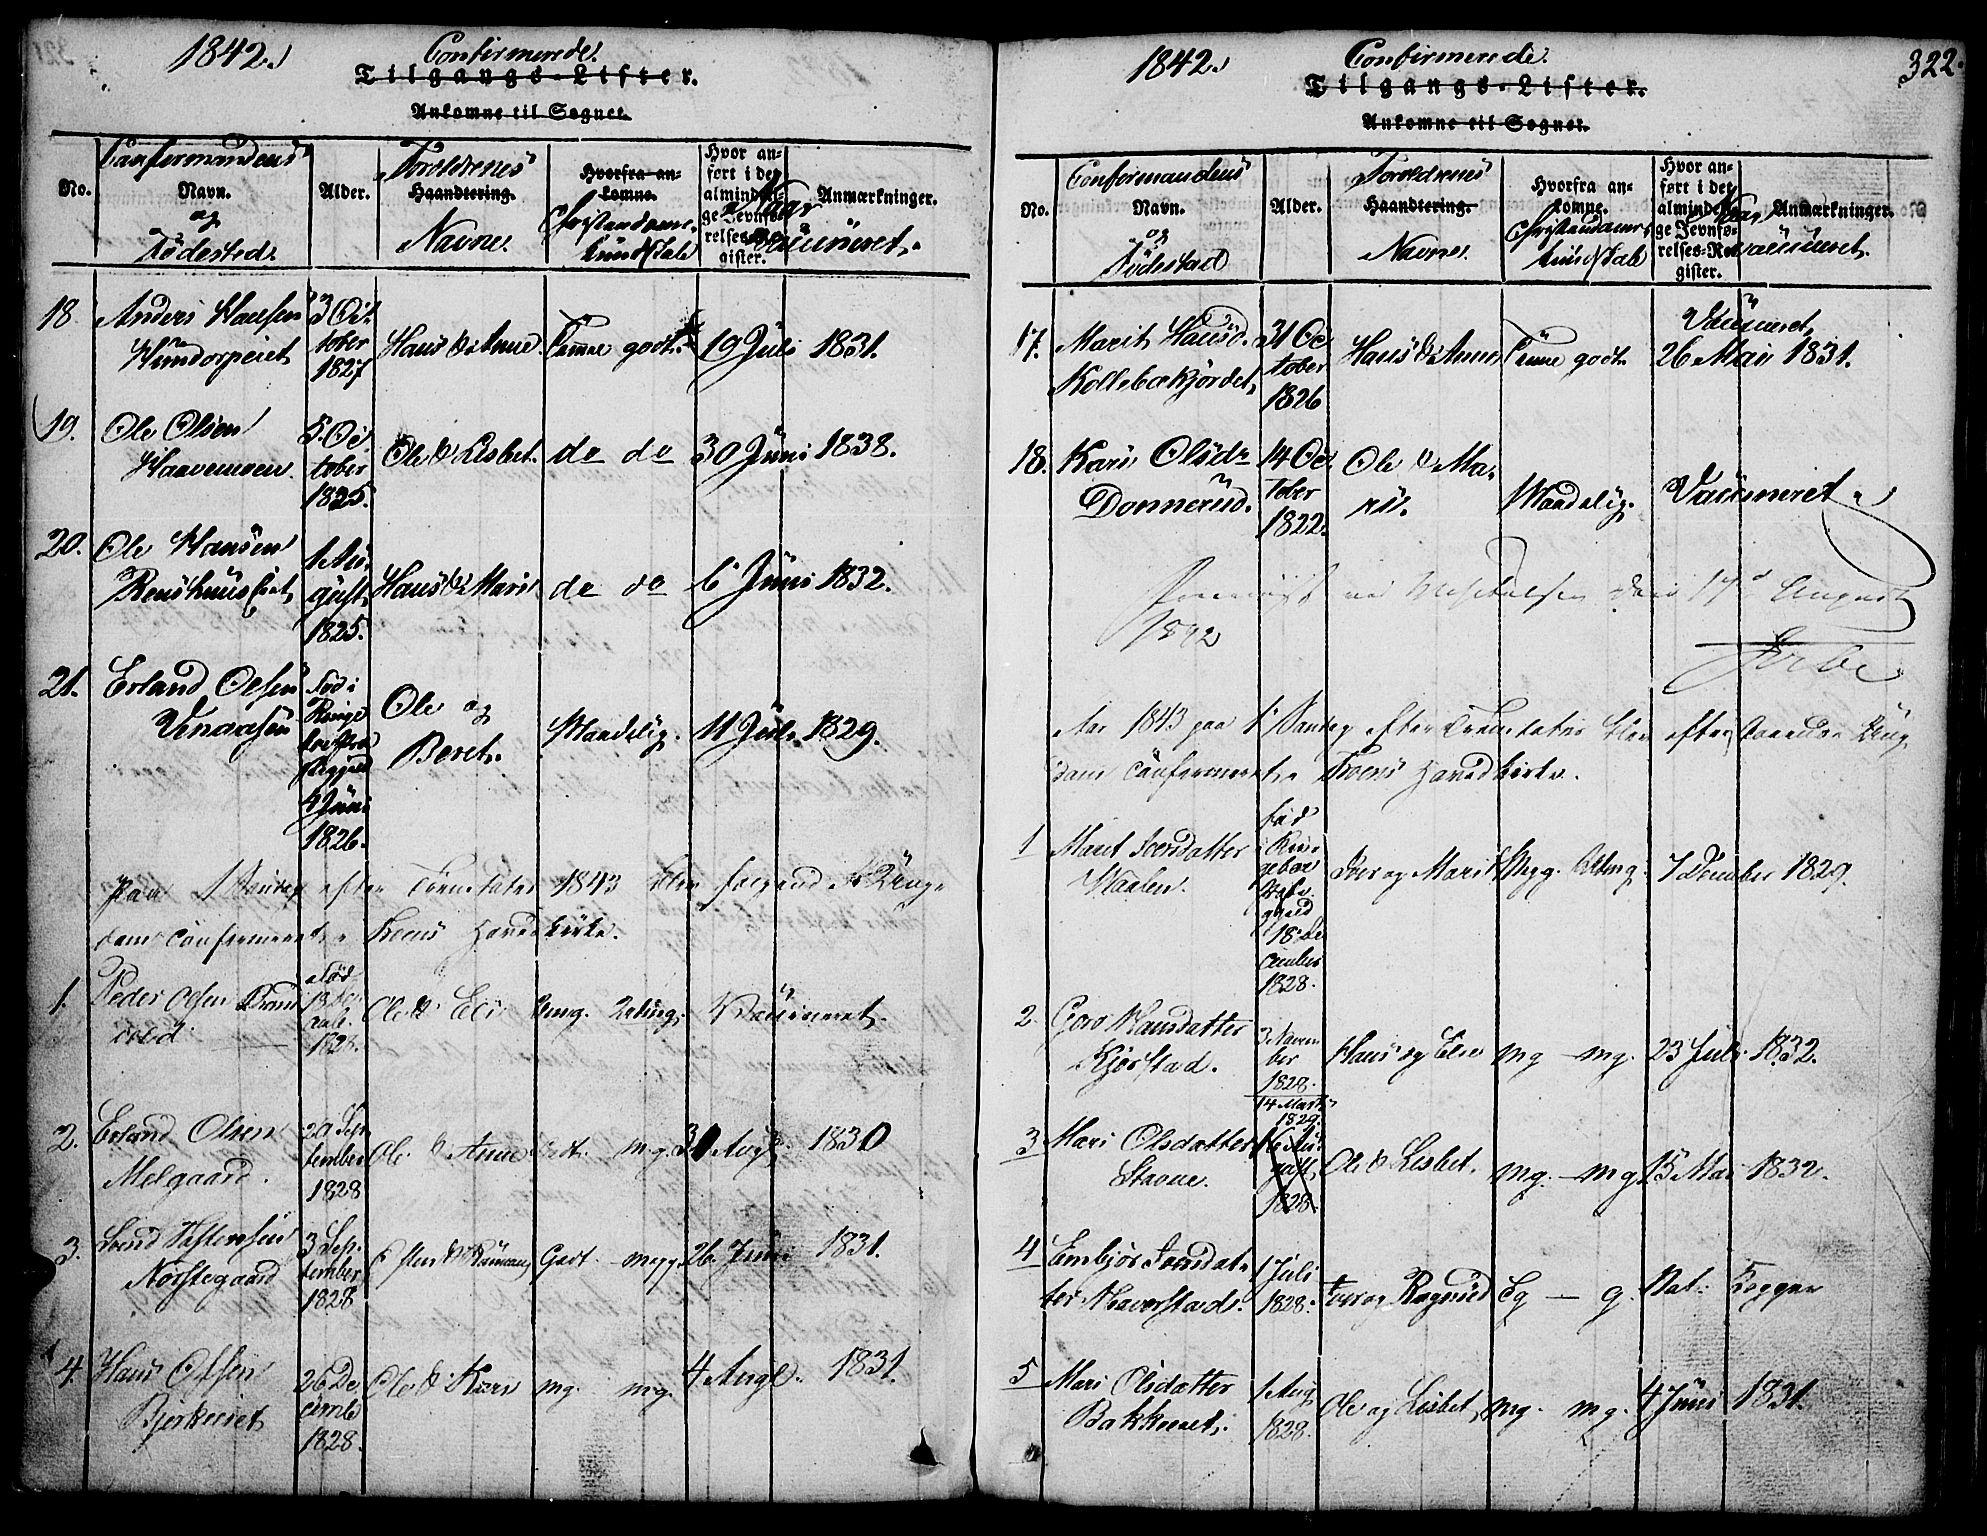 SAH, Fron prestekontor, H/Ha/Hab/L0001: Klokkerbok nr. 1, 1816-1843, s. 322